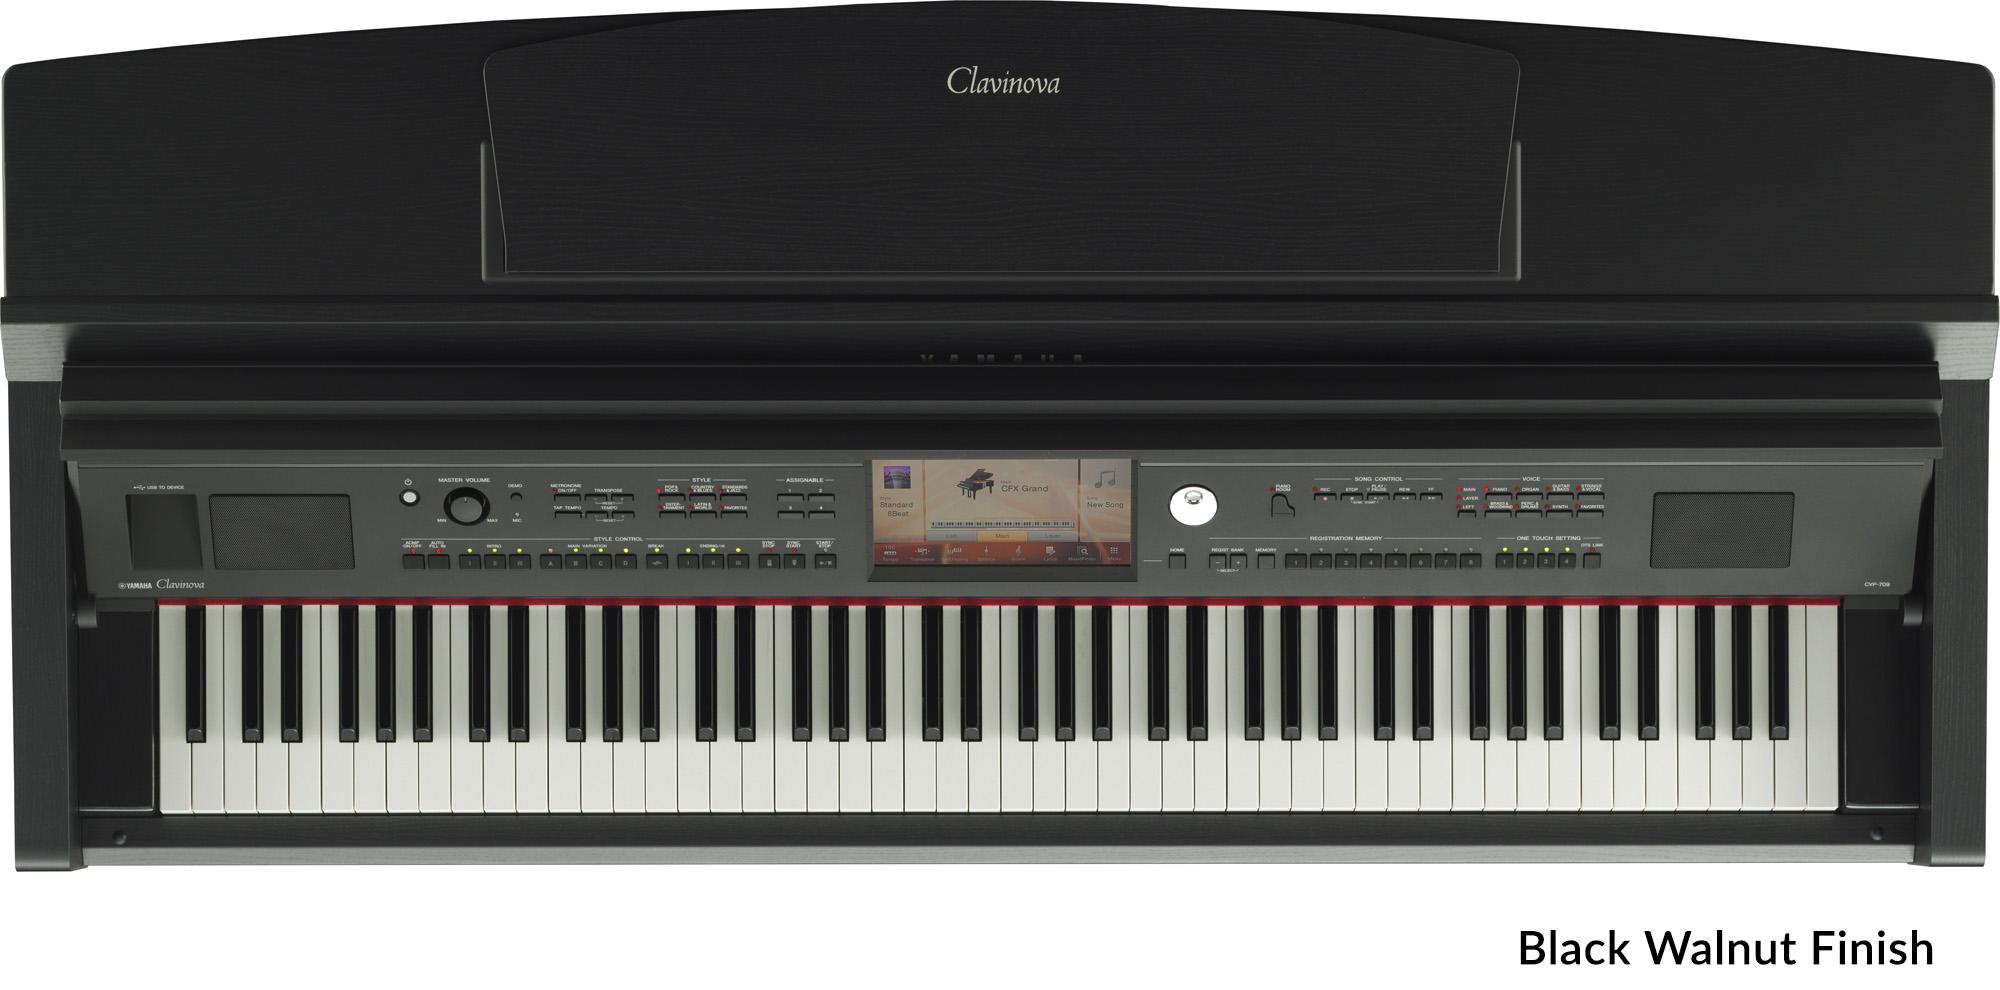 yamaha cvp 709 clavinova digital pianos in polished ebony polished white and black walnut. Black Bedroom Furniture Sets. Home Design Ideas